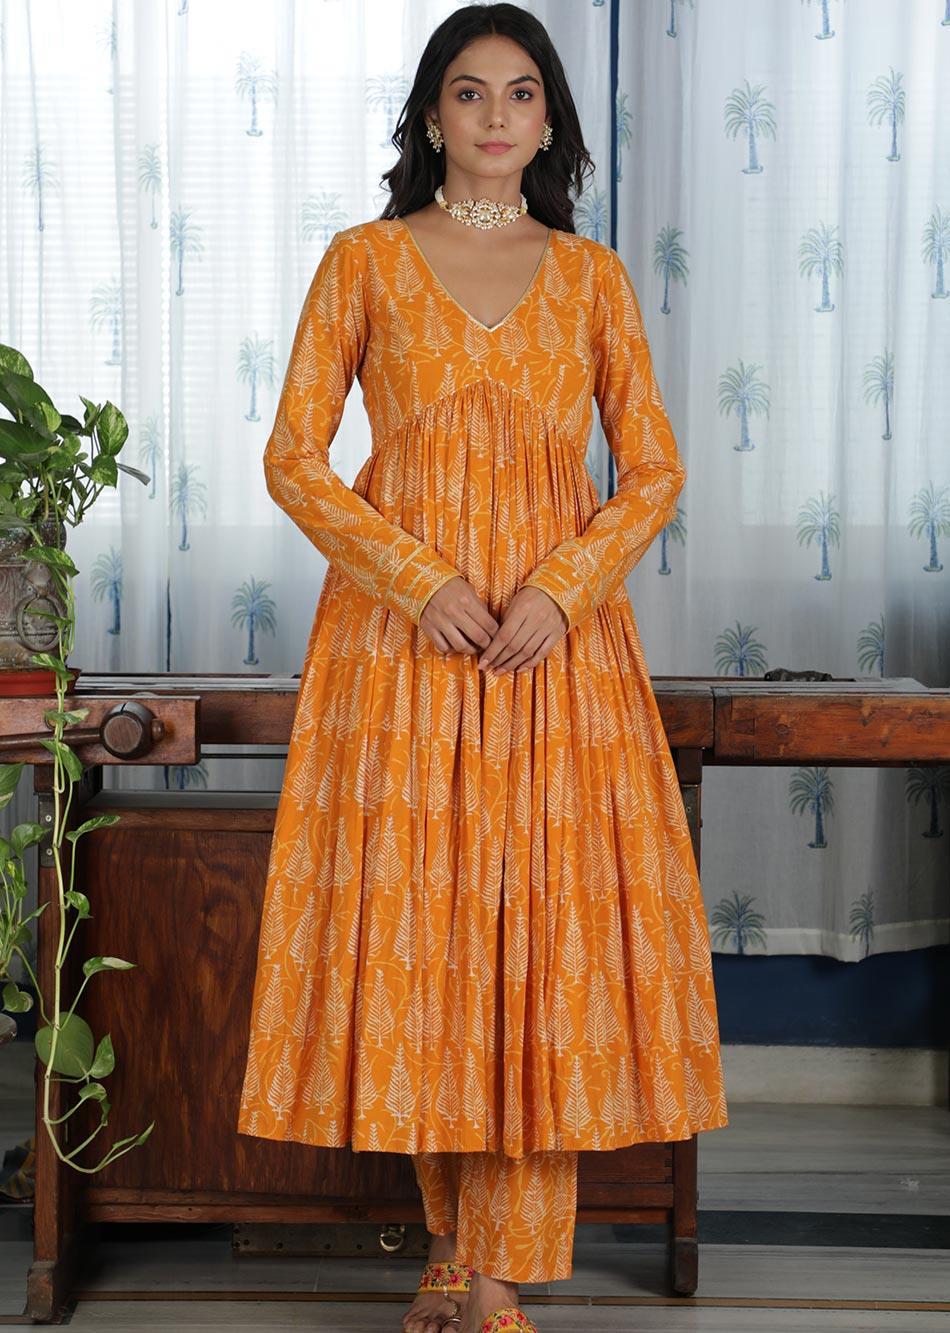 MOH Honey Gathered Anarkali Kurta (only kurta) By Jovi Fashion